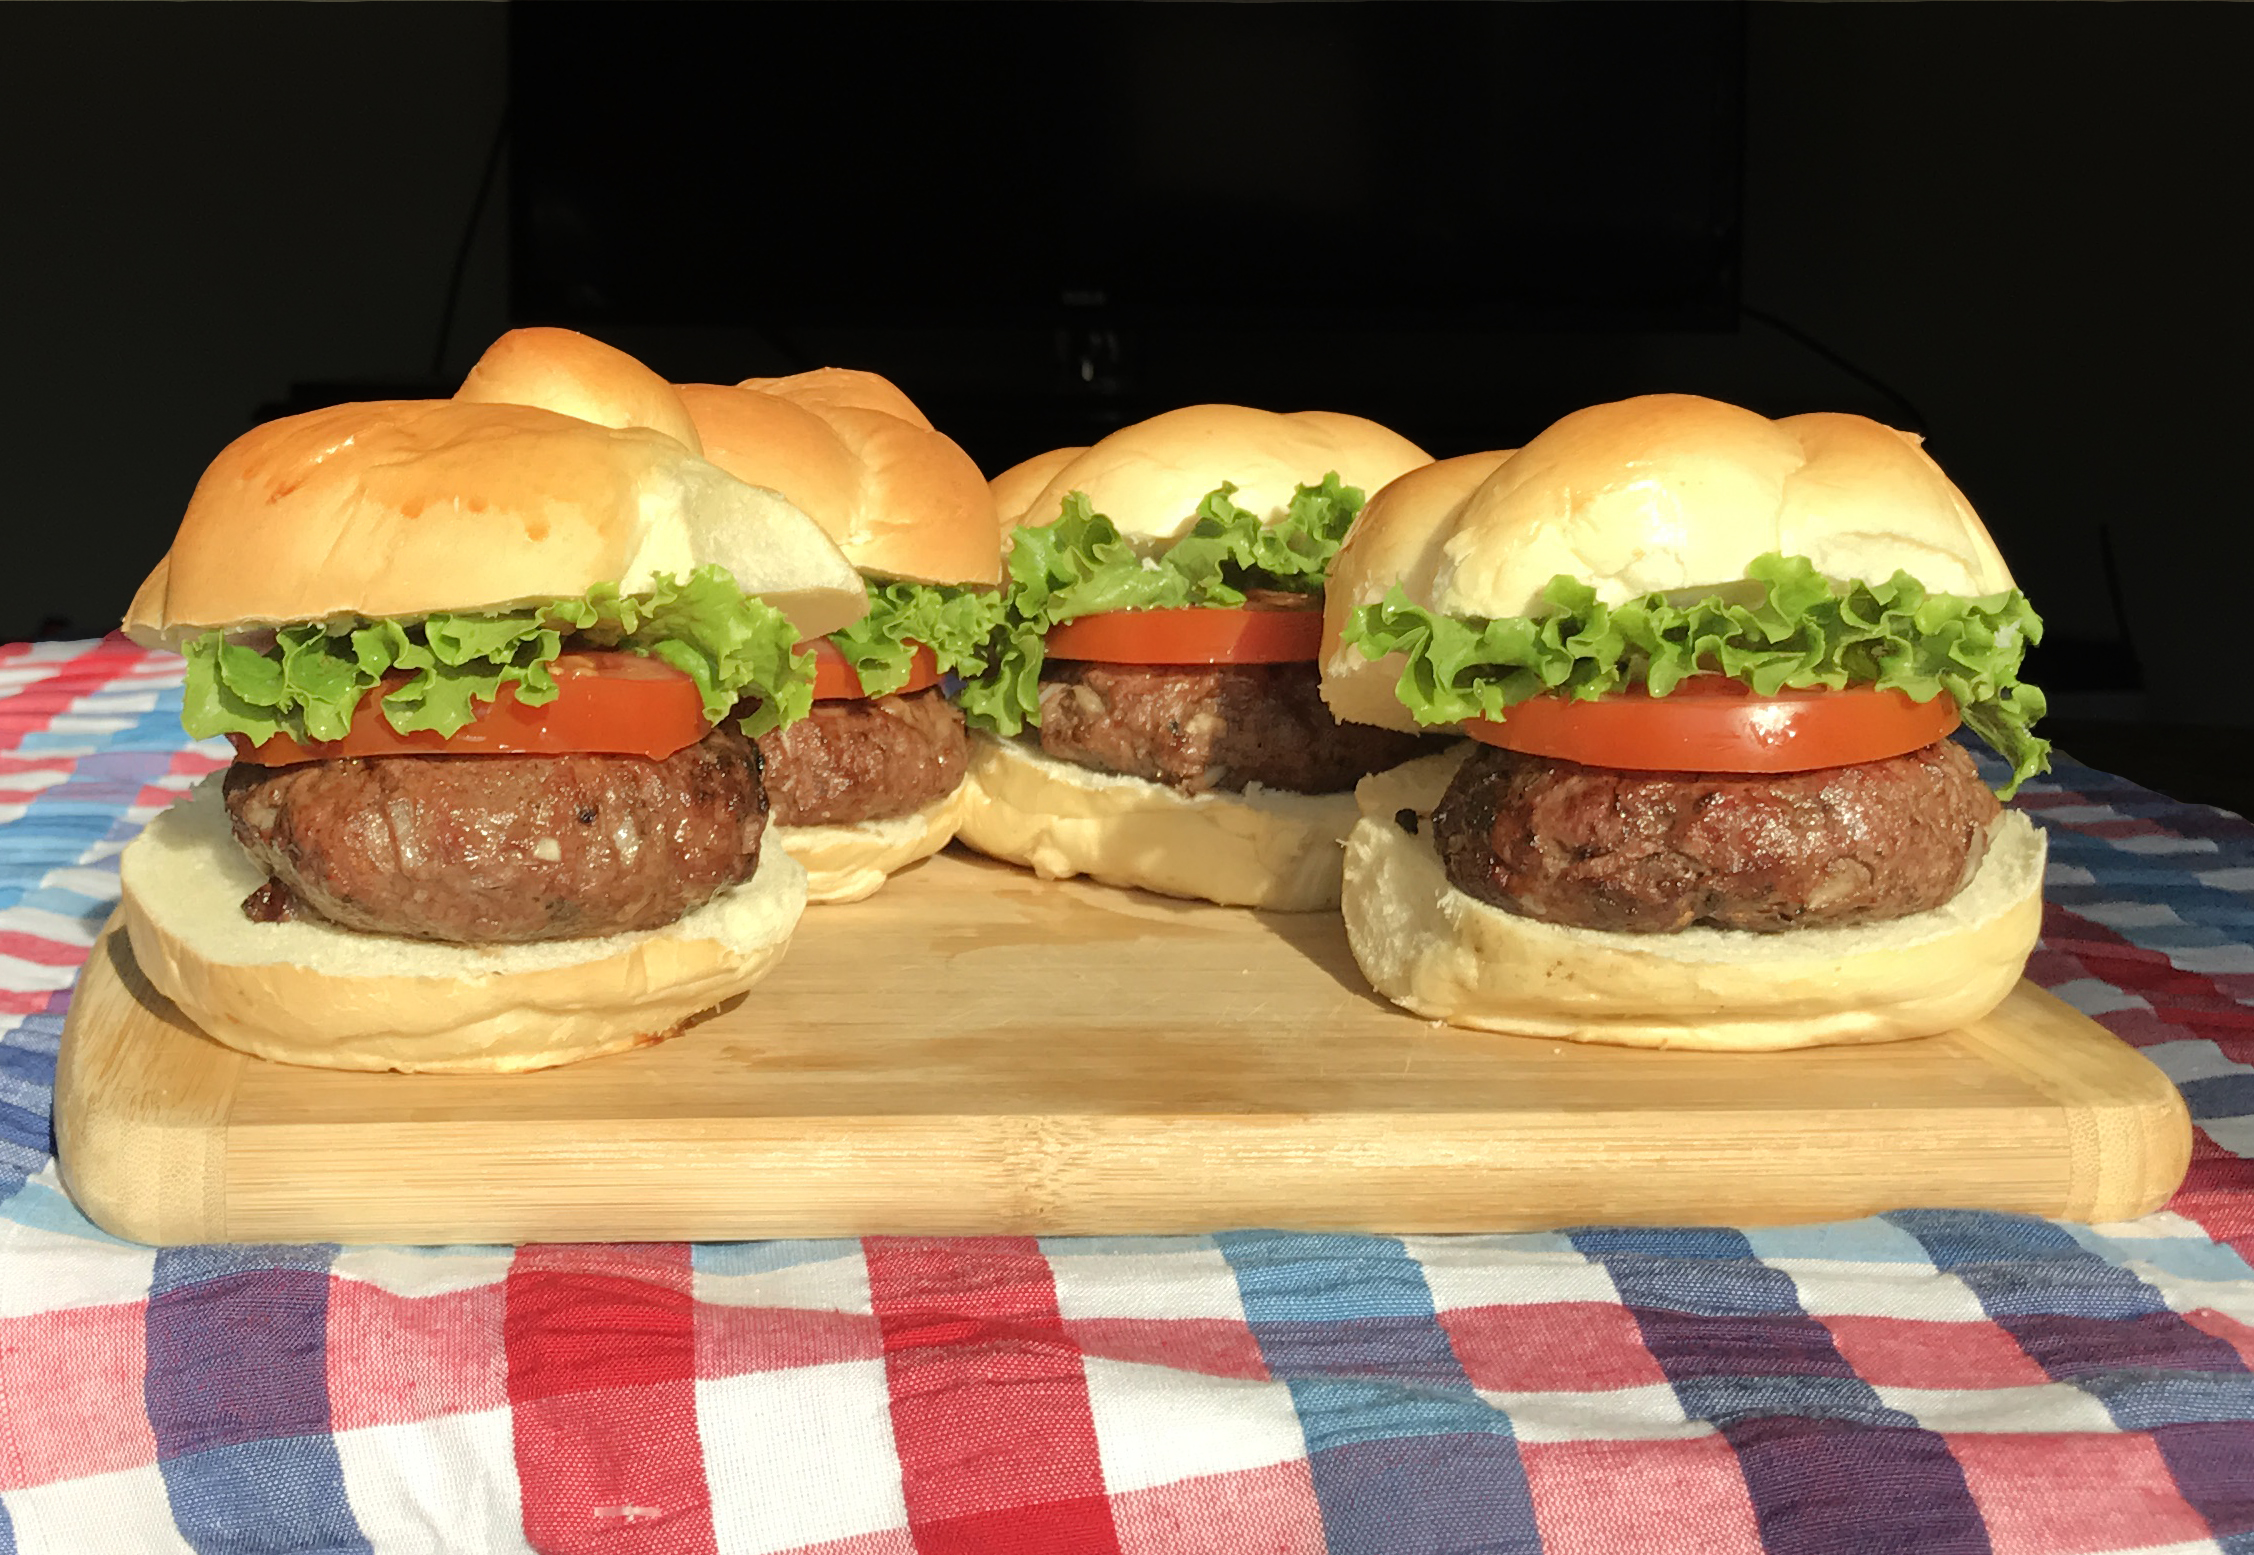 KitchAnnette FIrecracker Burger 4 straight